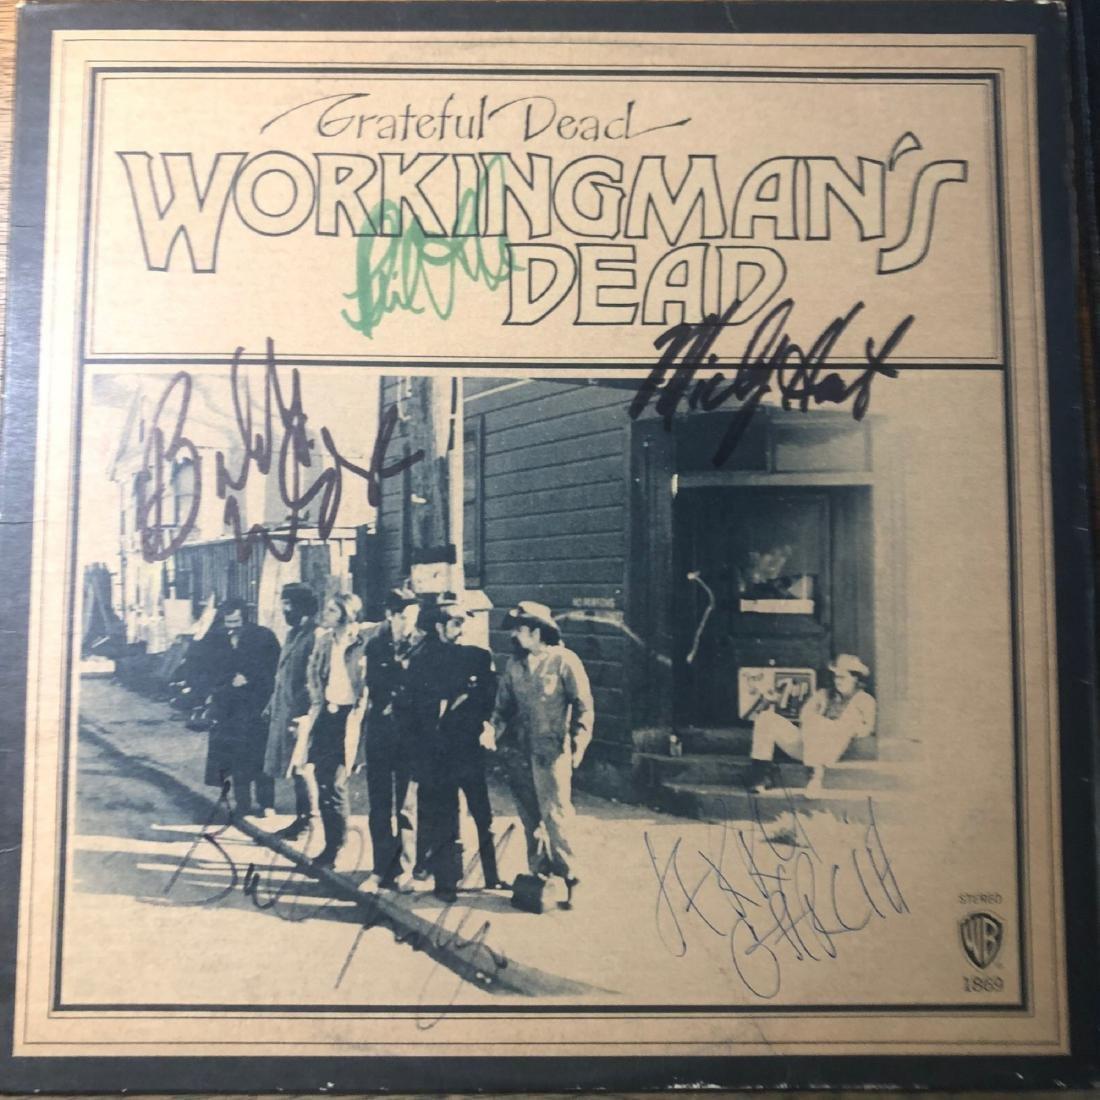 Signed Grateful Dead Workingman's Dead Album